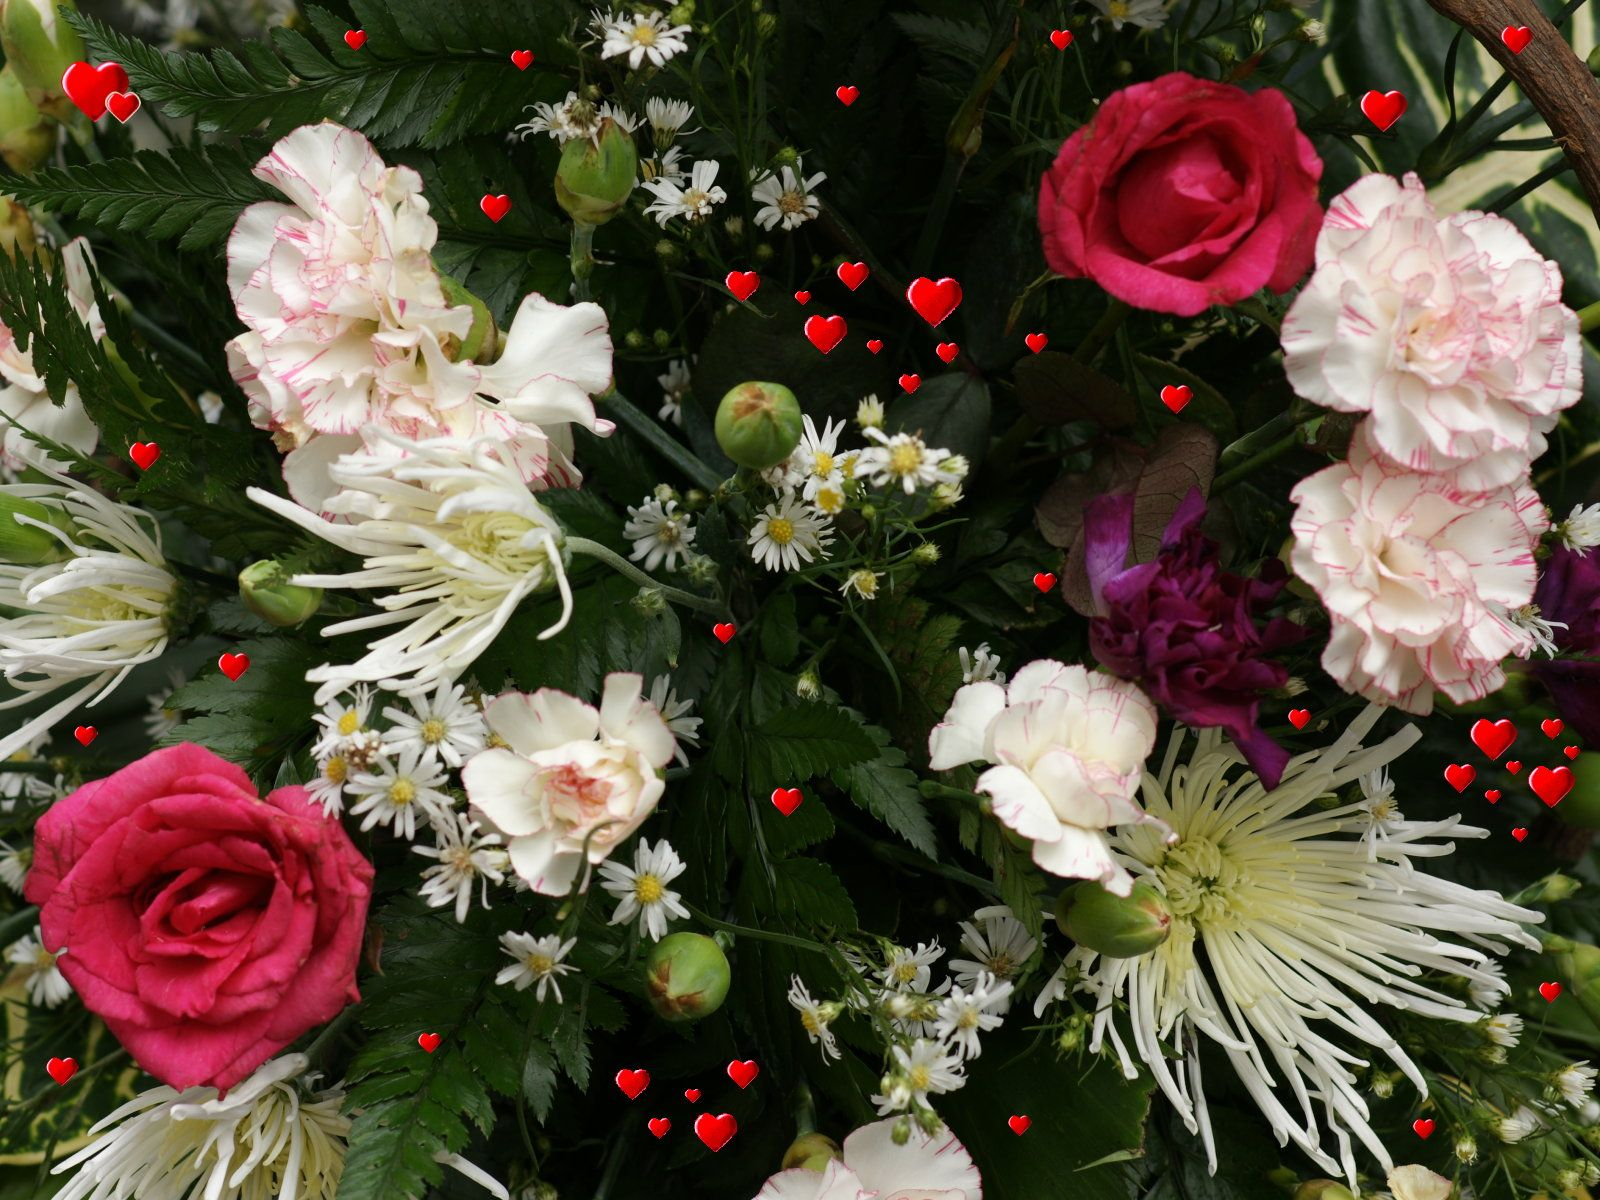 Tips to arrange a flower garden and how to do it beautiful flowers beautiful flowers in the world flowers typeofflower beautiful izmirmasajfo